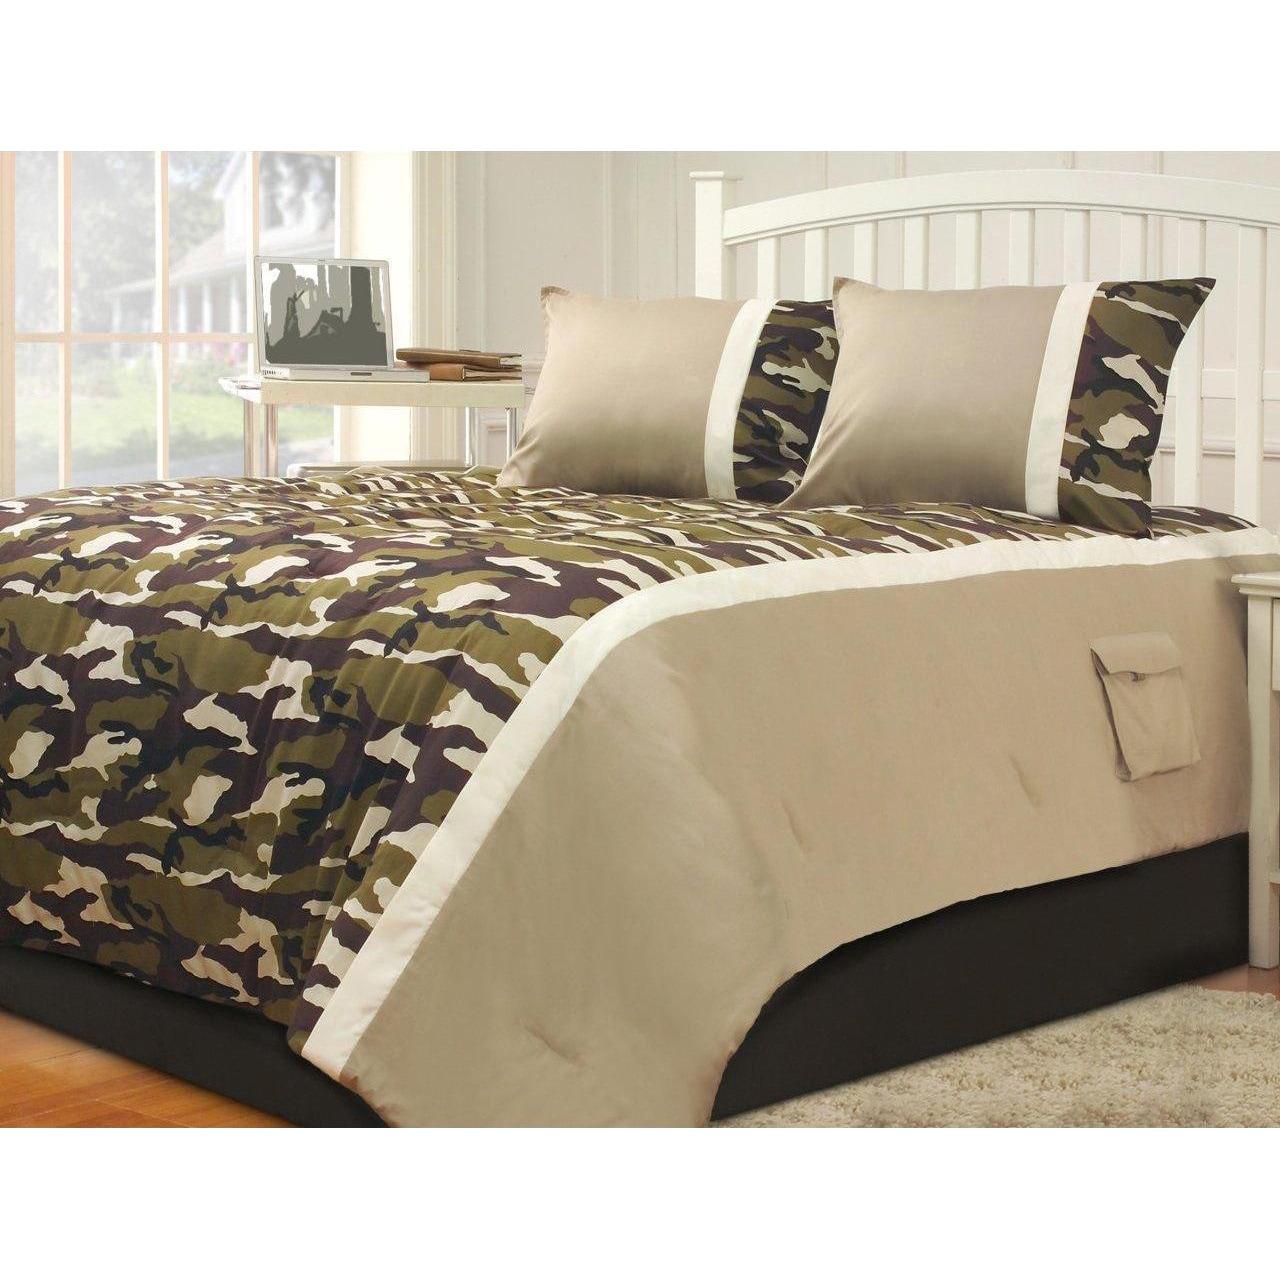 Hallmart Collectibles Camouflage King 3-piece Comforter S...